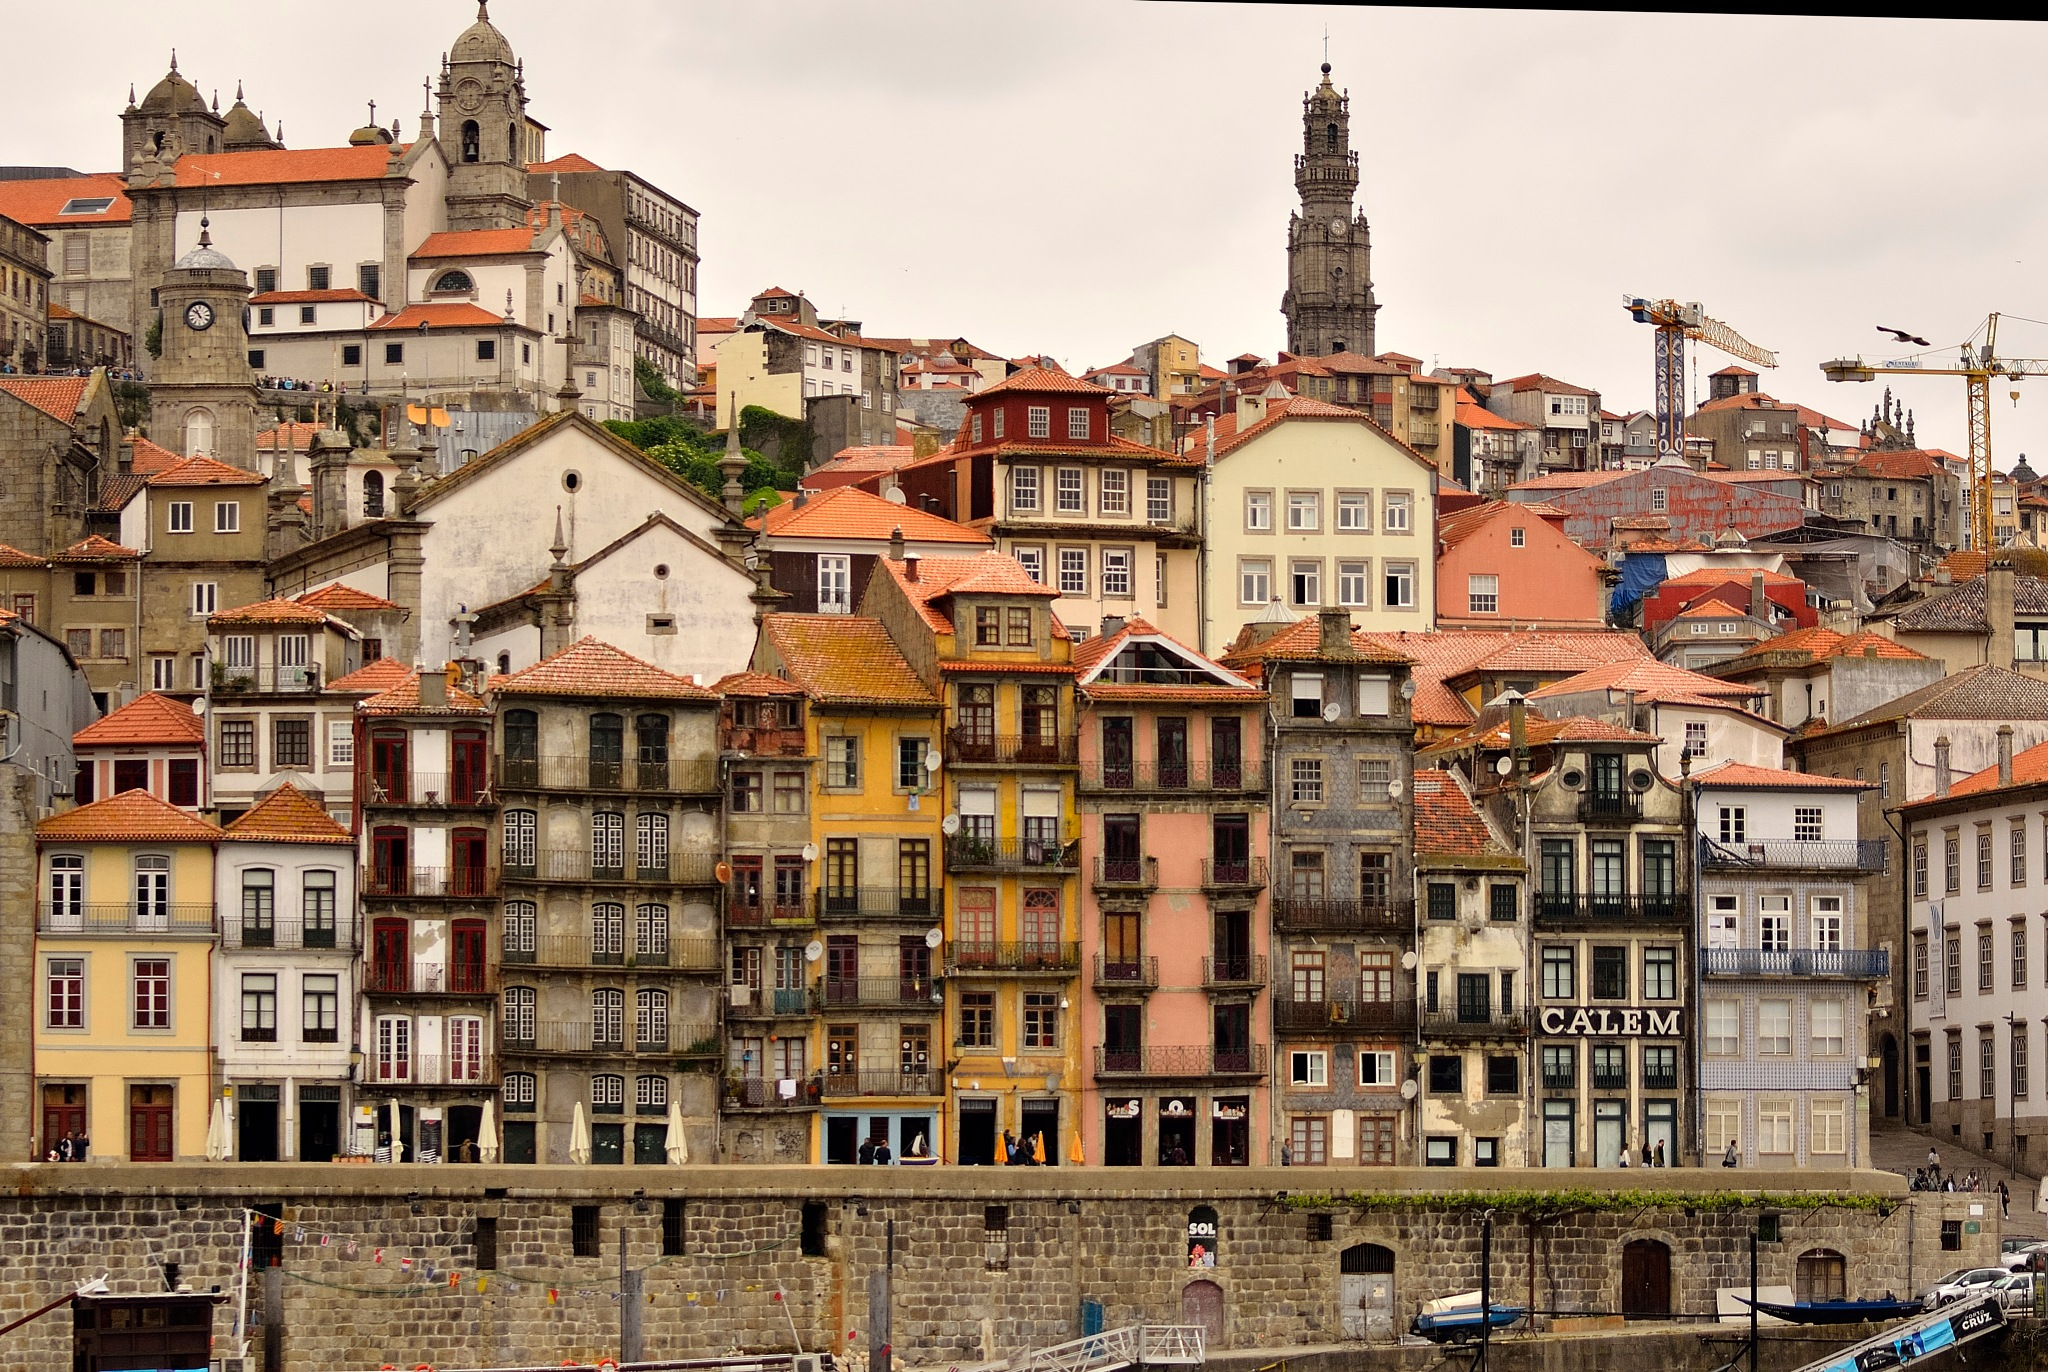 Down Town by João Almeida